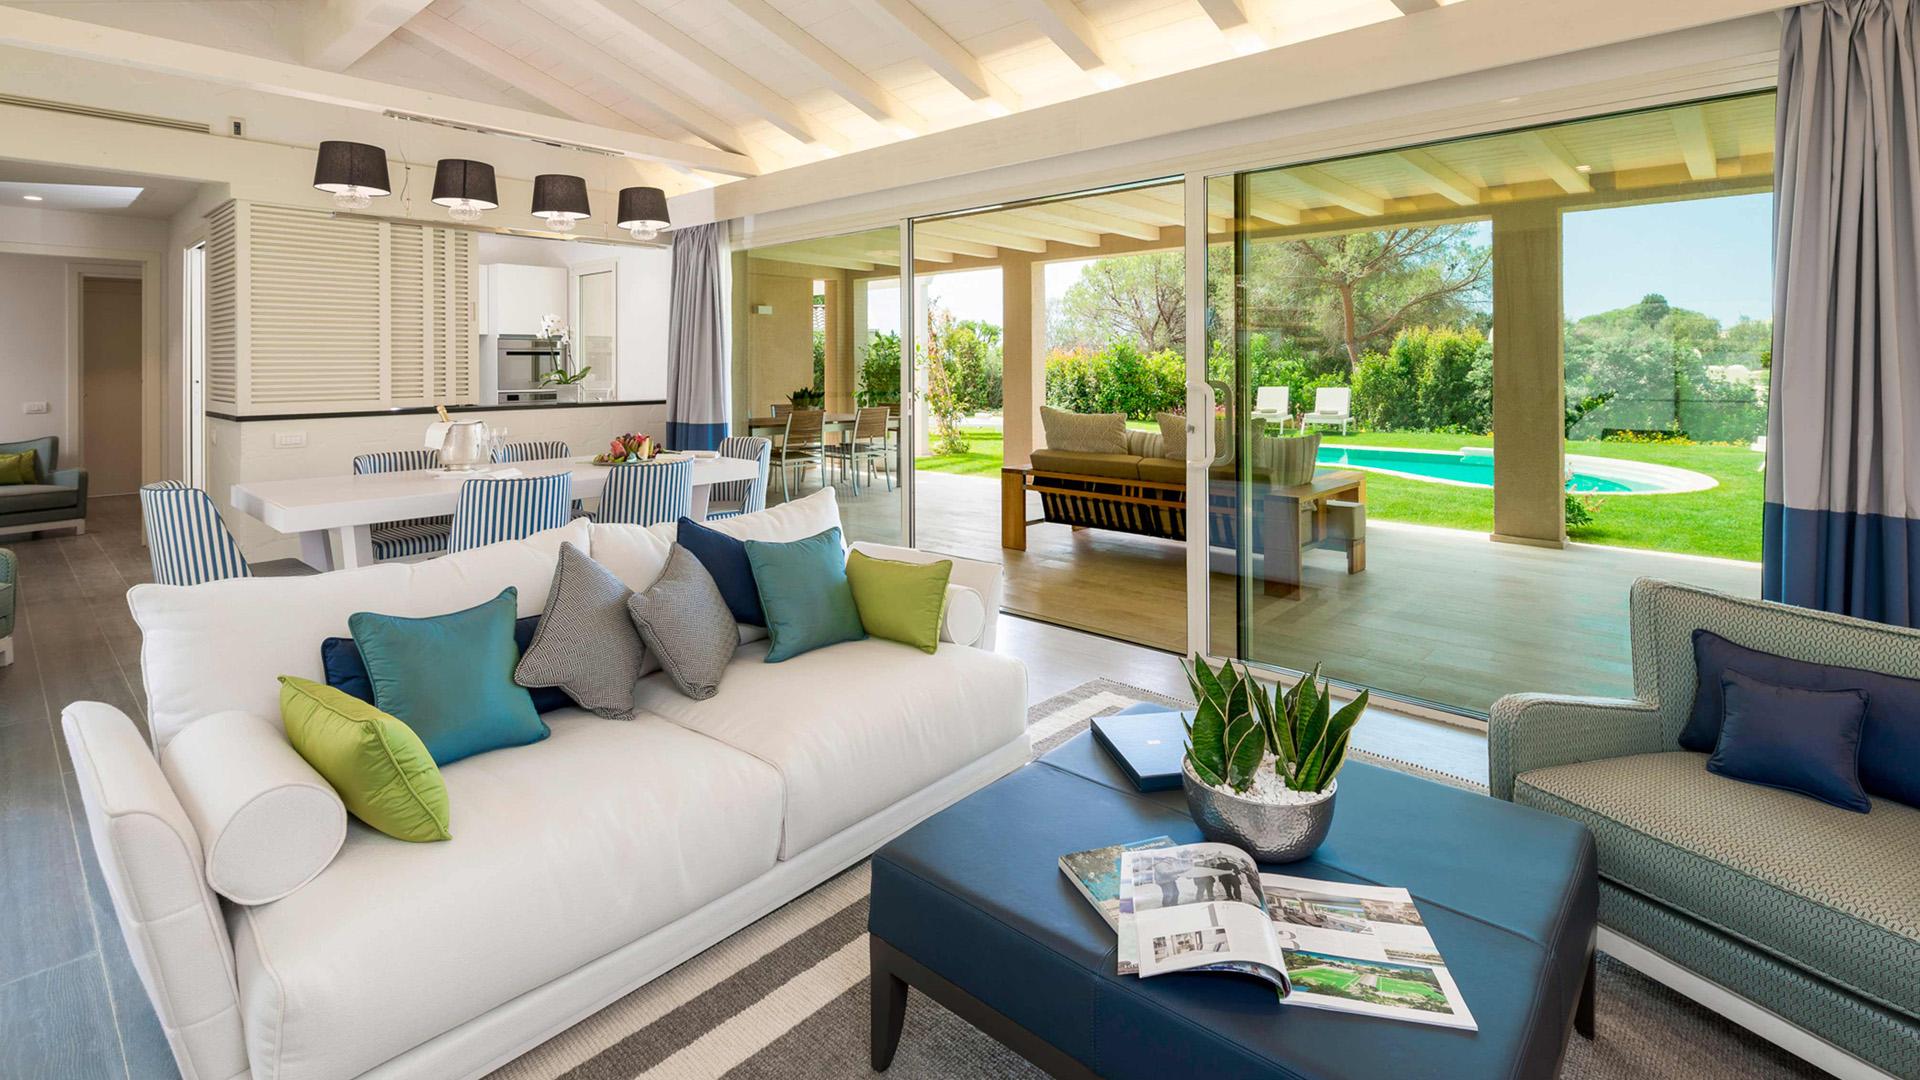 100% Home Inmobiliaria